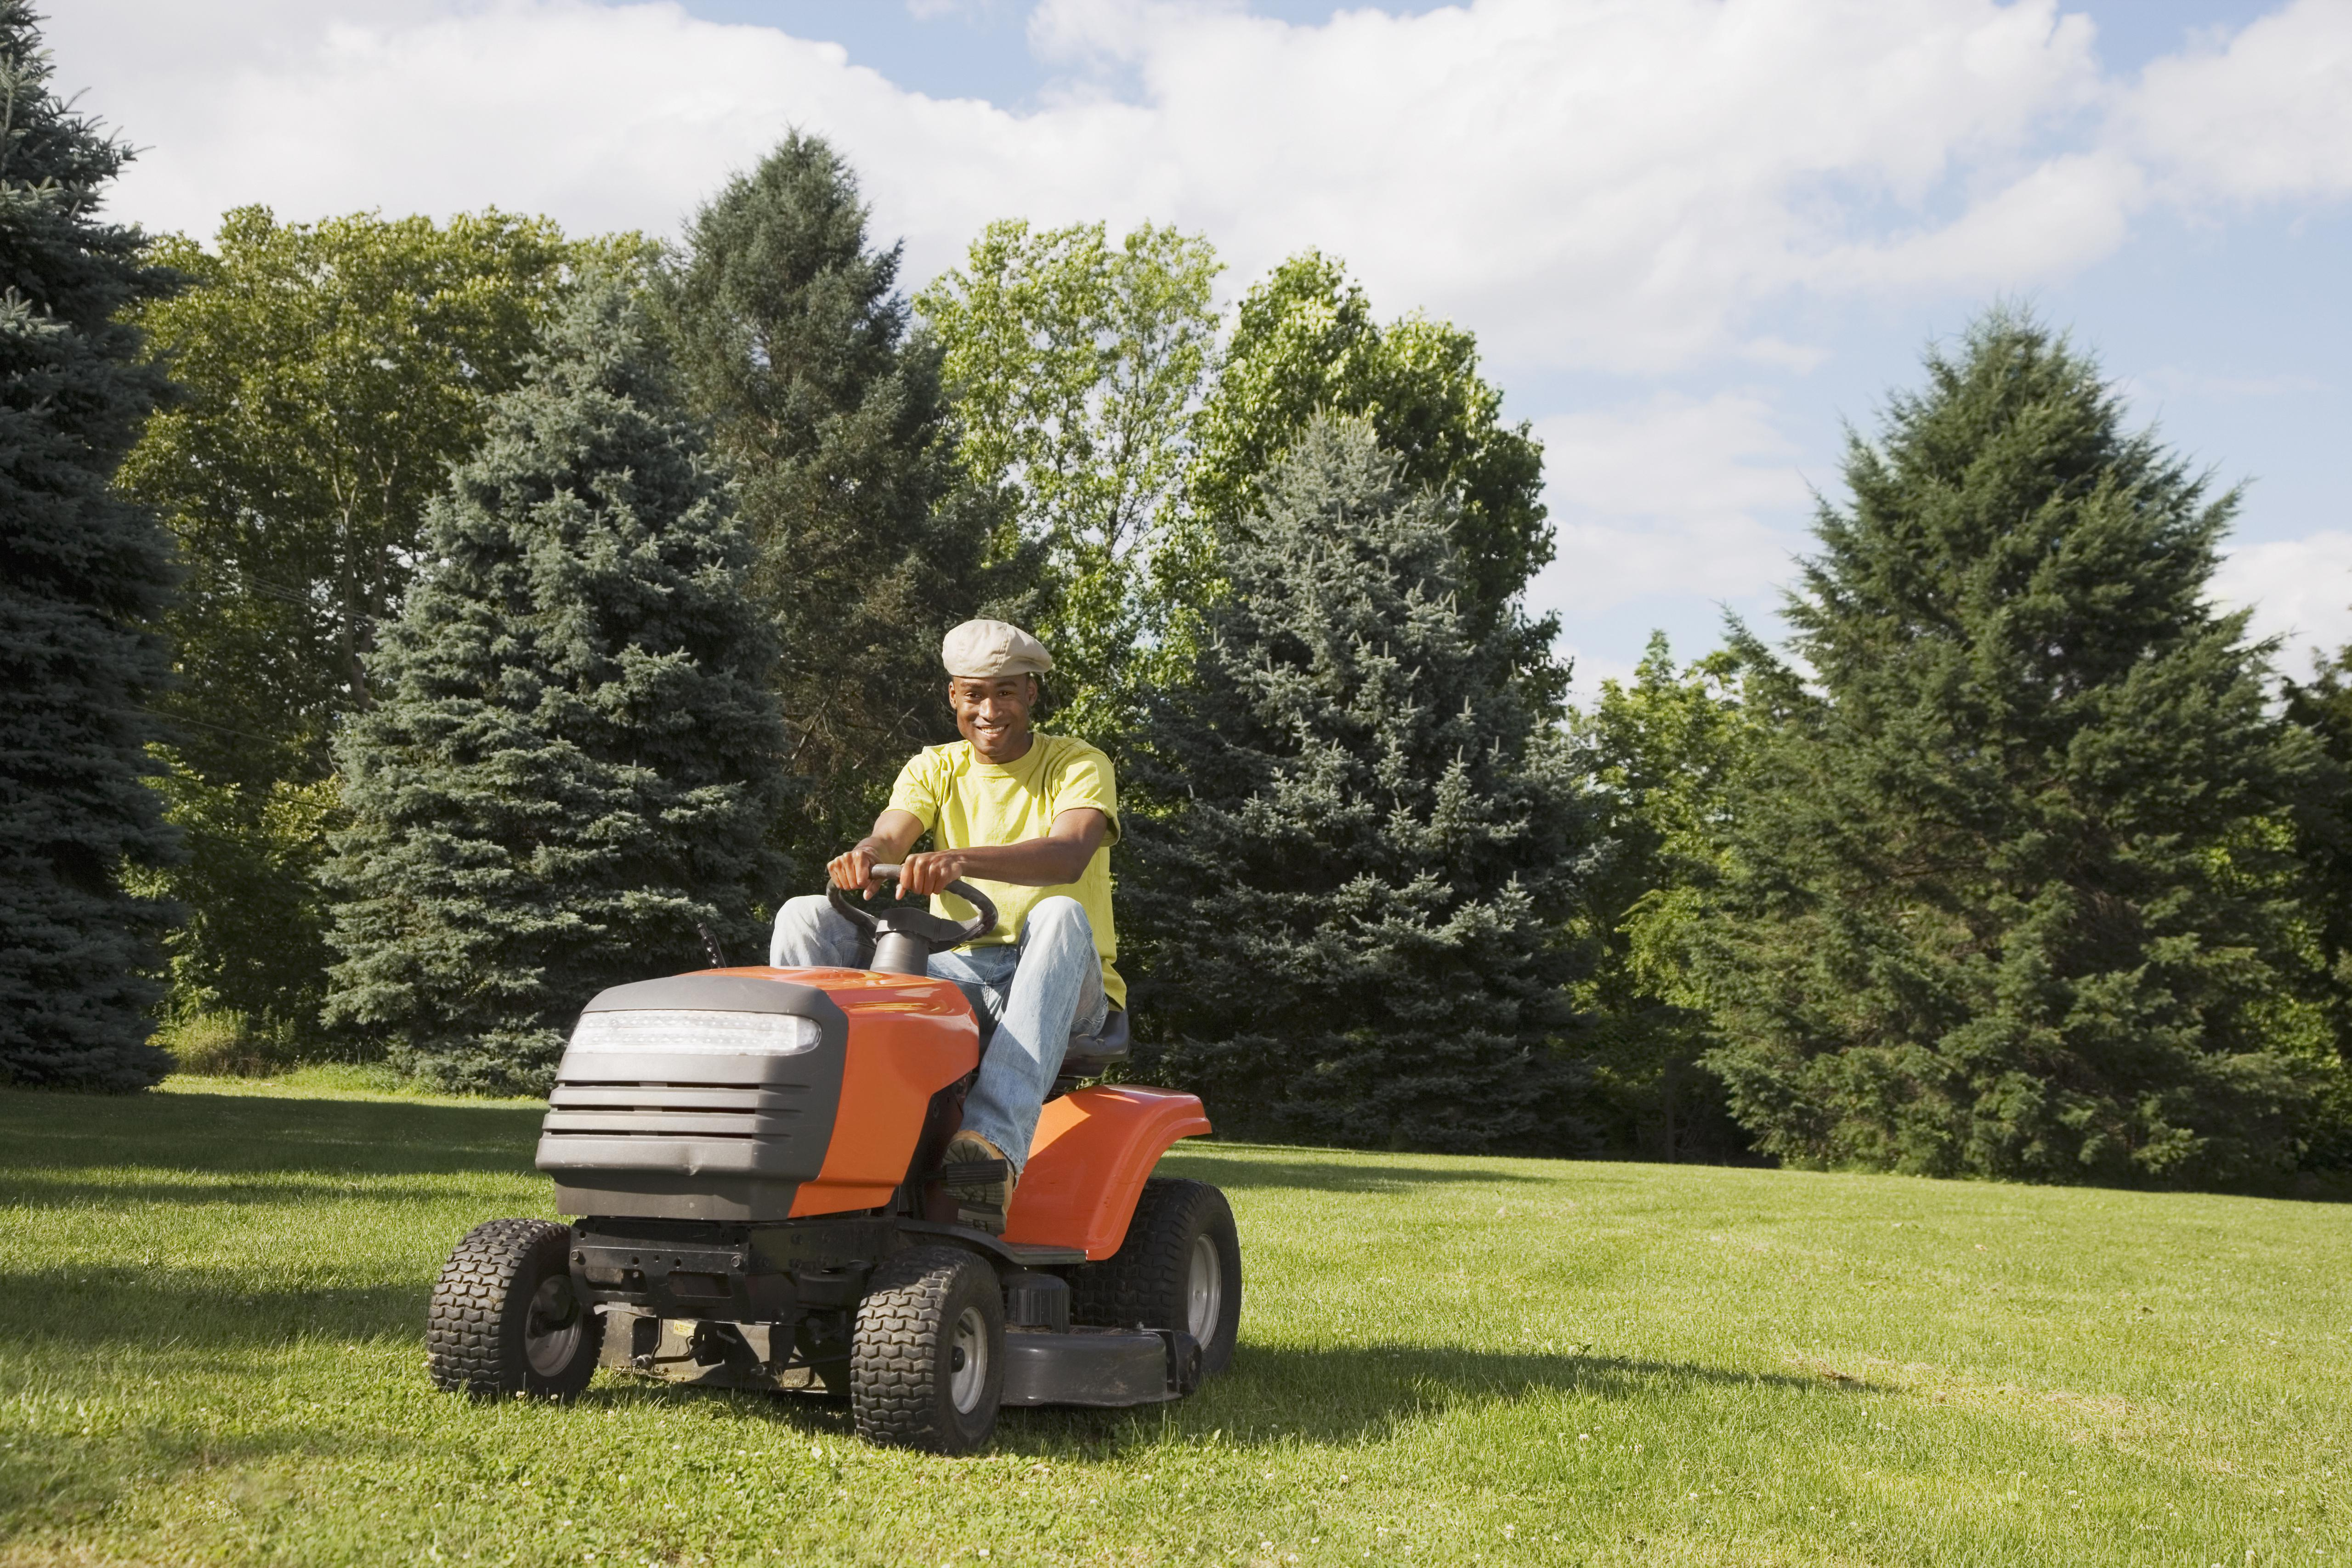 African American man mowing lawn